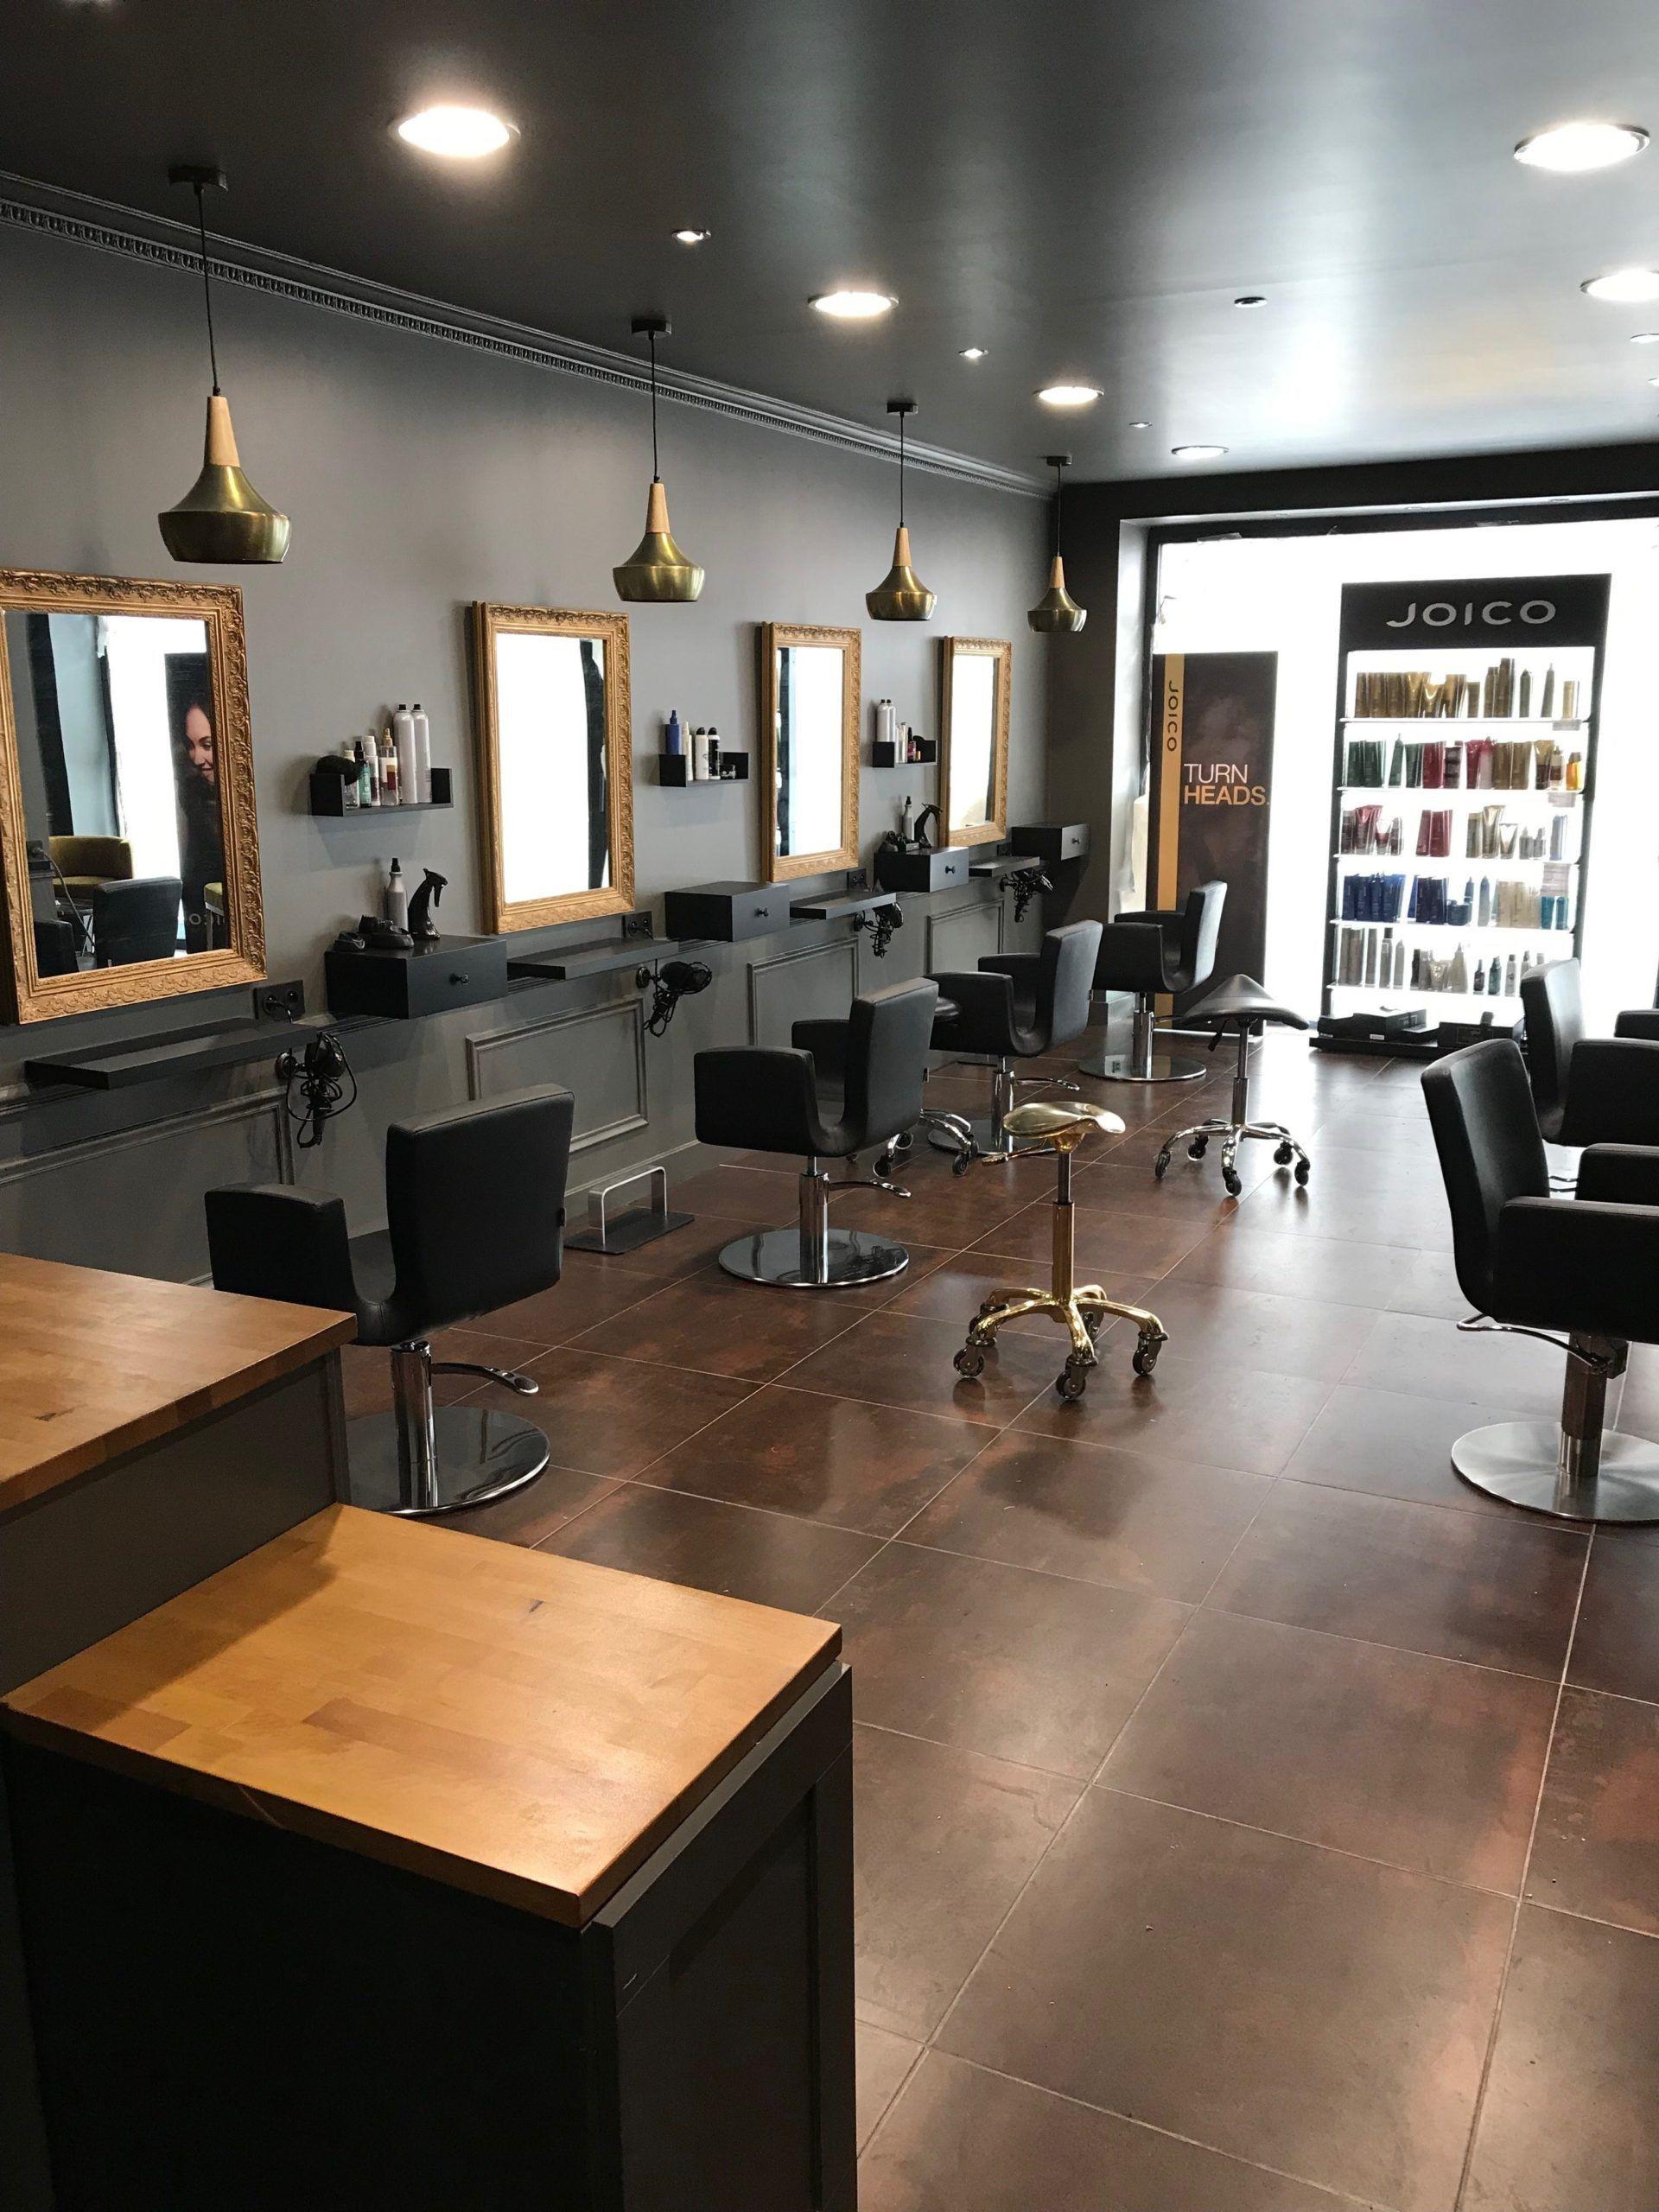 Decoration Salon Coiffure 2020 Decoration Salon De Coiffure Deco Salon De Coiffure Decoration Salon